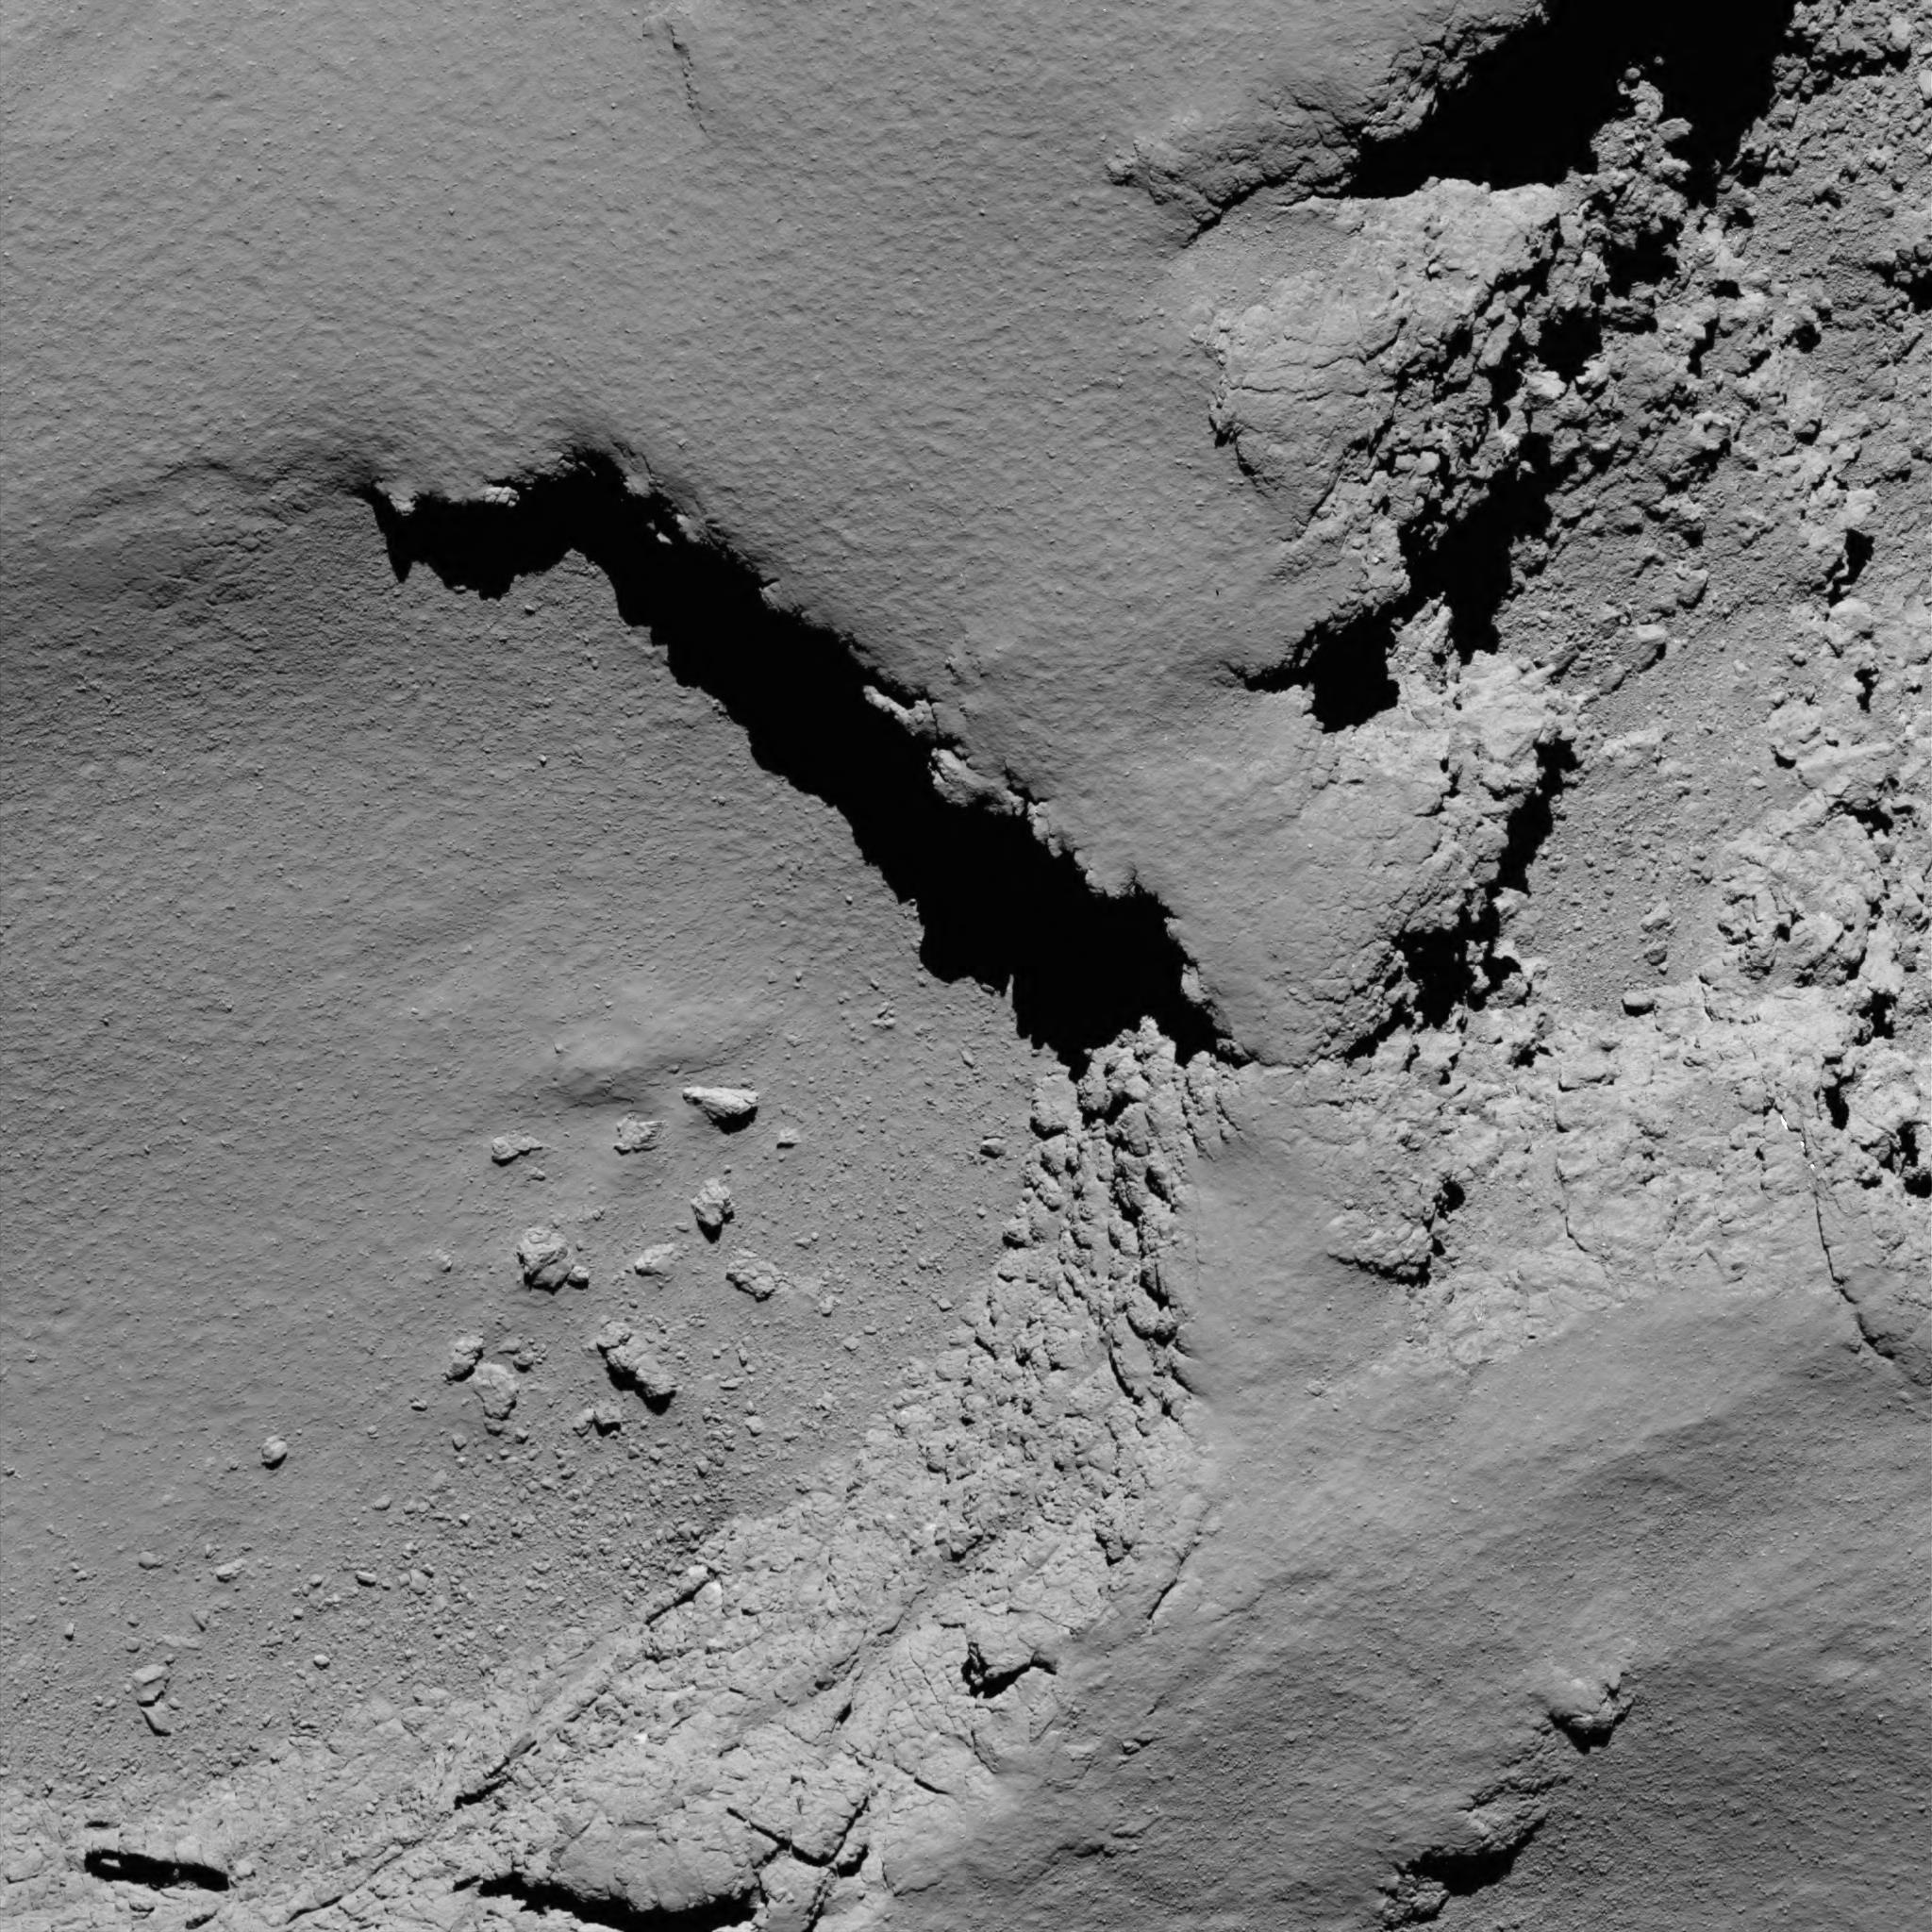 1567214492951-Rosetta_OSIRIS_NAC_Comet_67P_20160930T0818.jpg